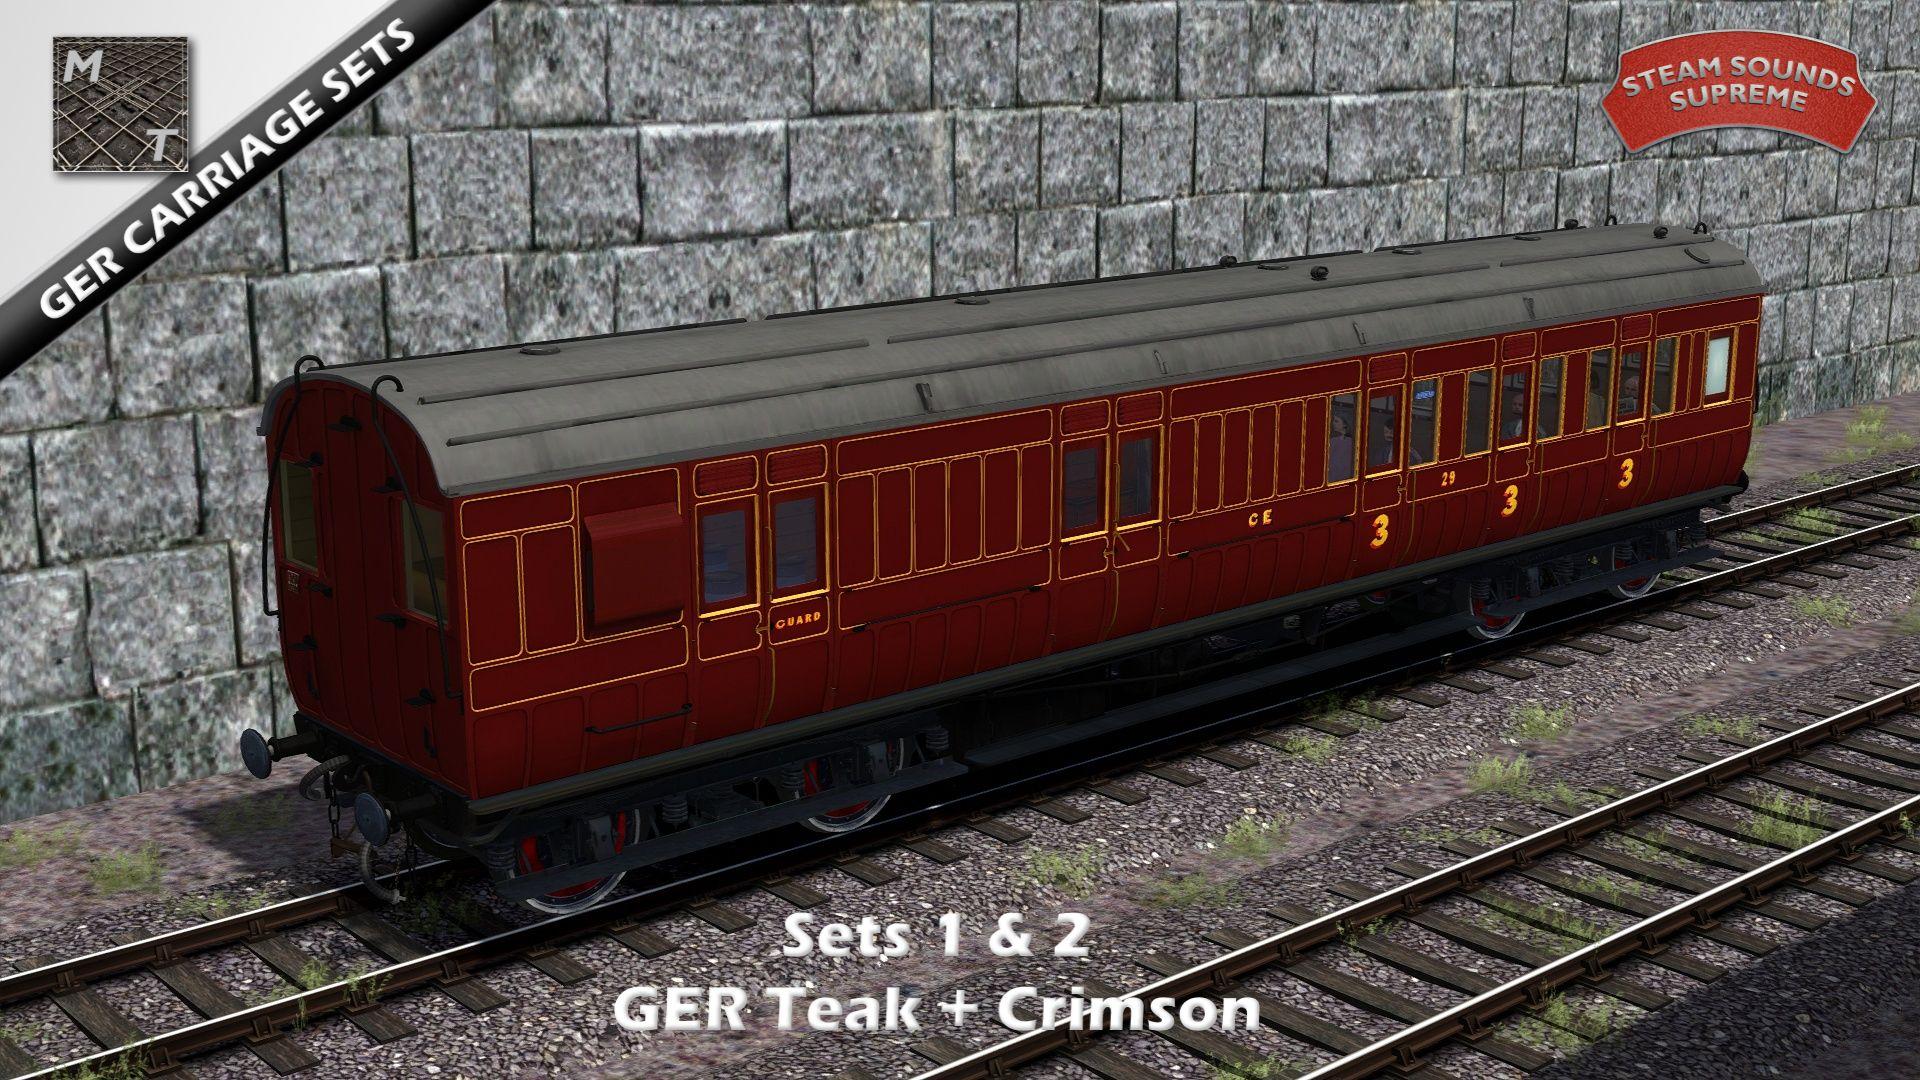 GERCorrSet1-2_14.jpg